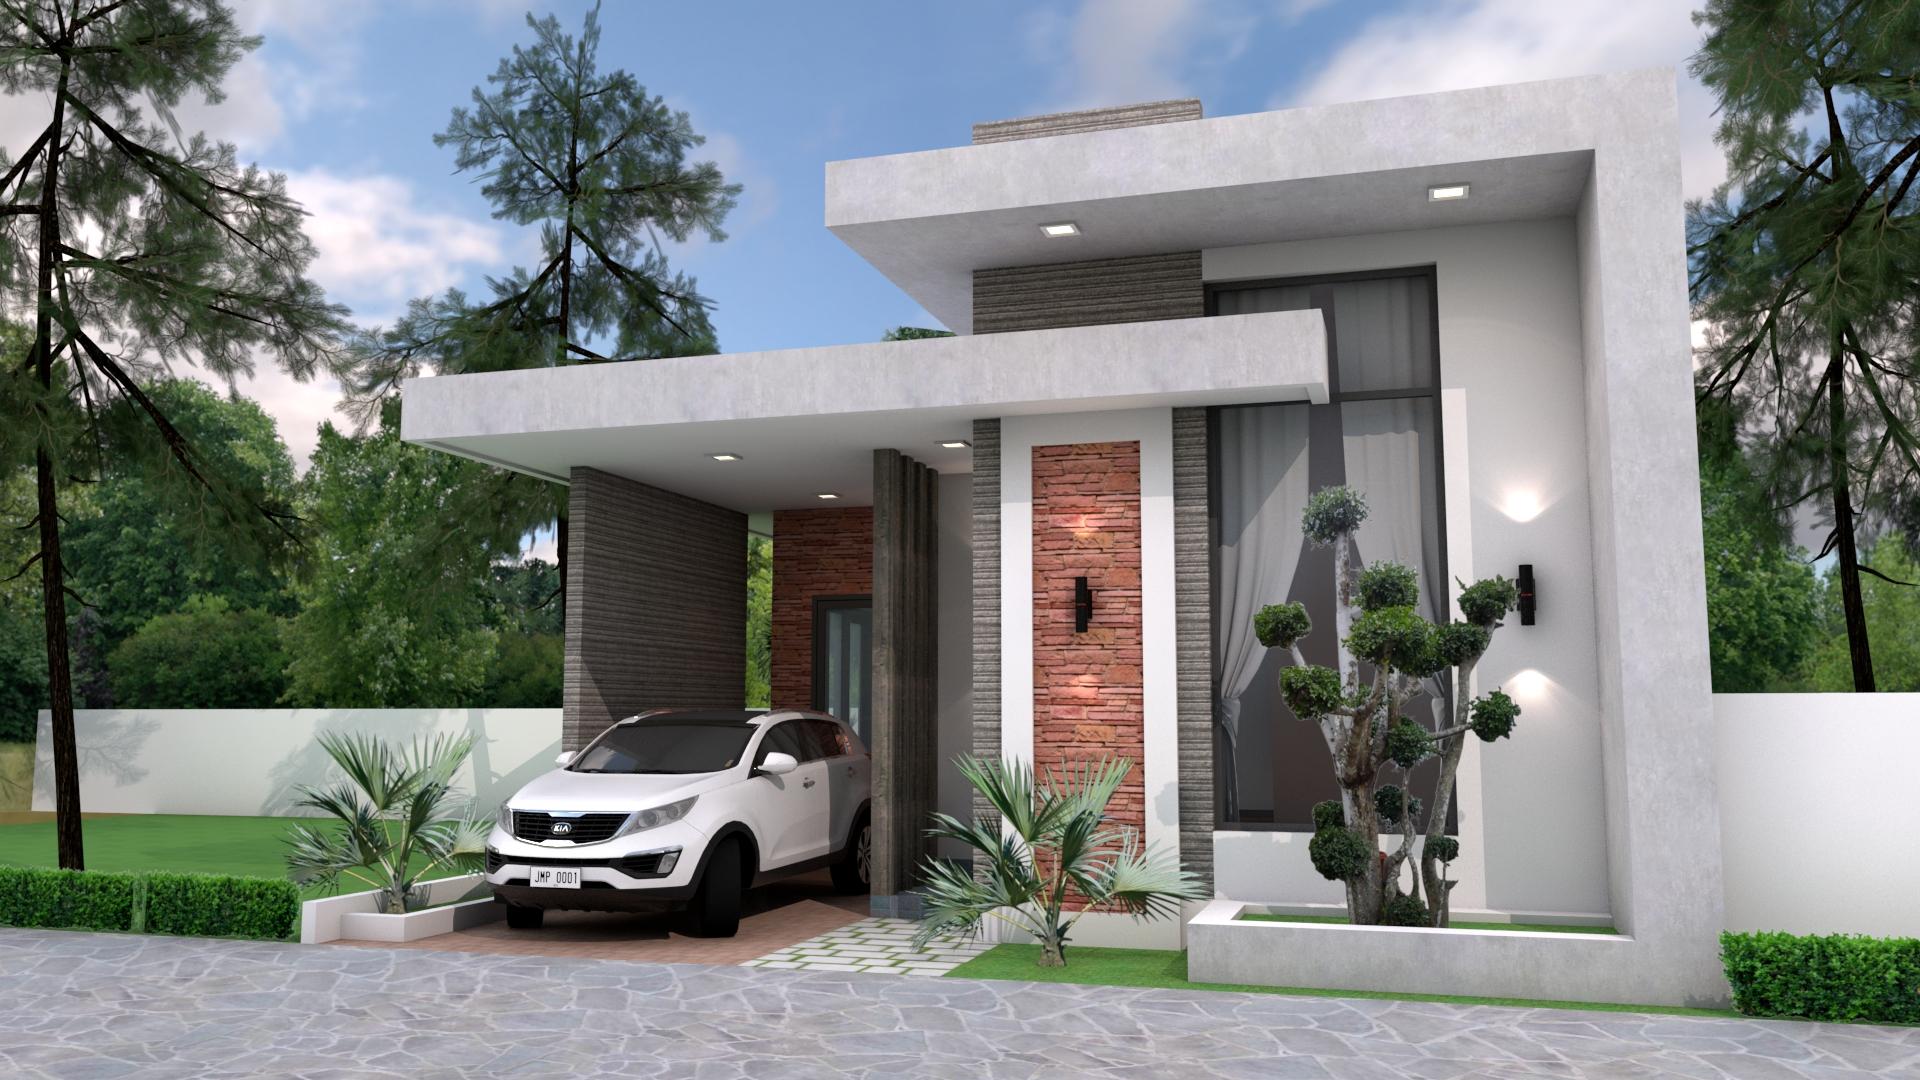 Best Small House Designs 8x10 Meter 26x33 Feet 3